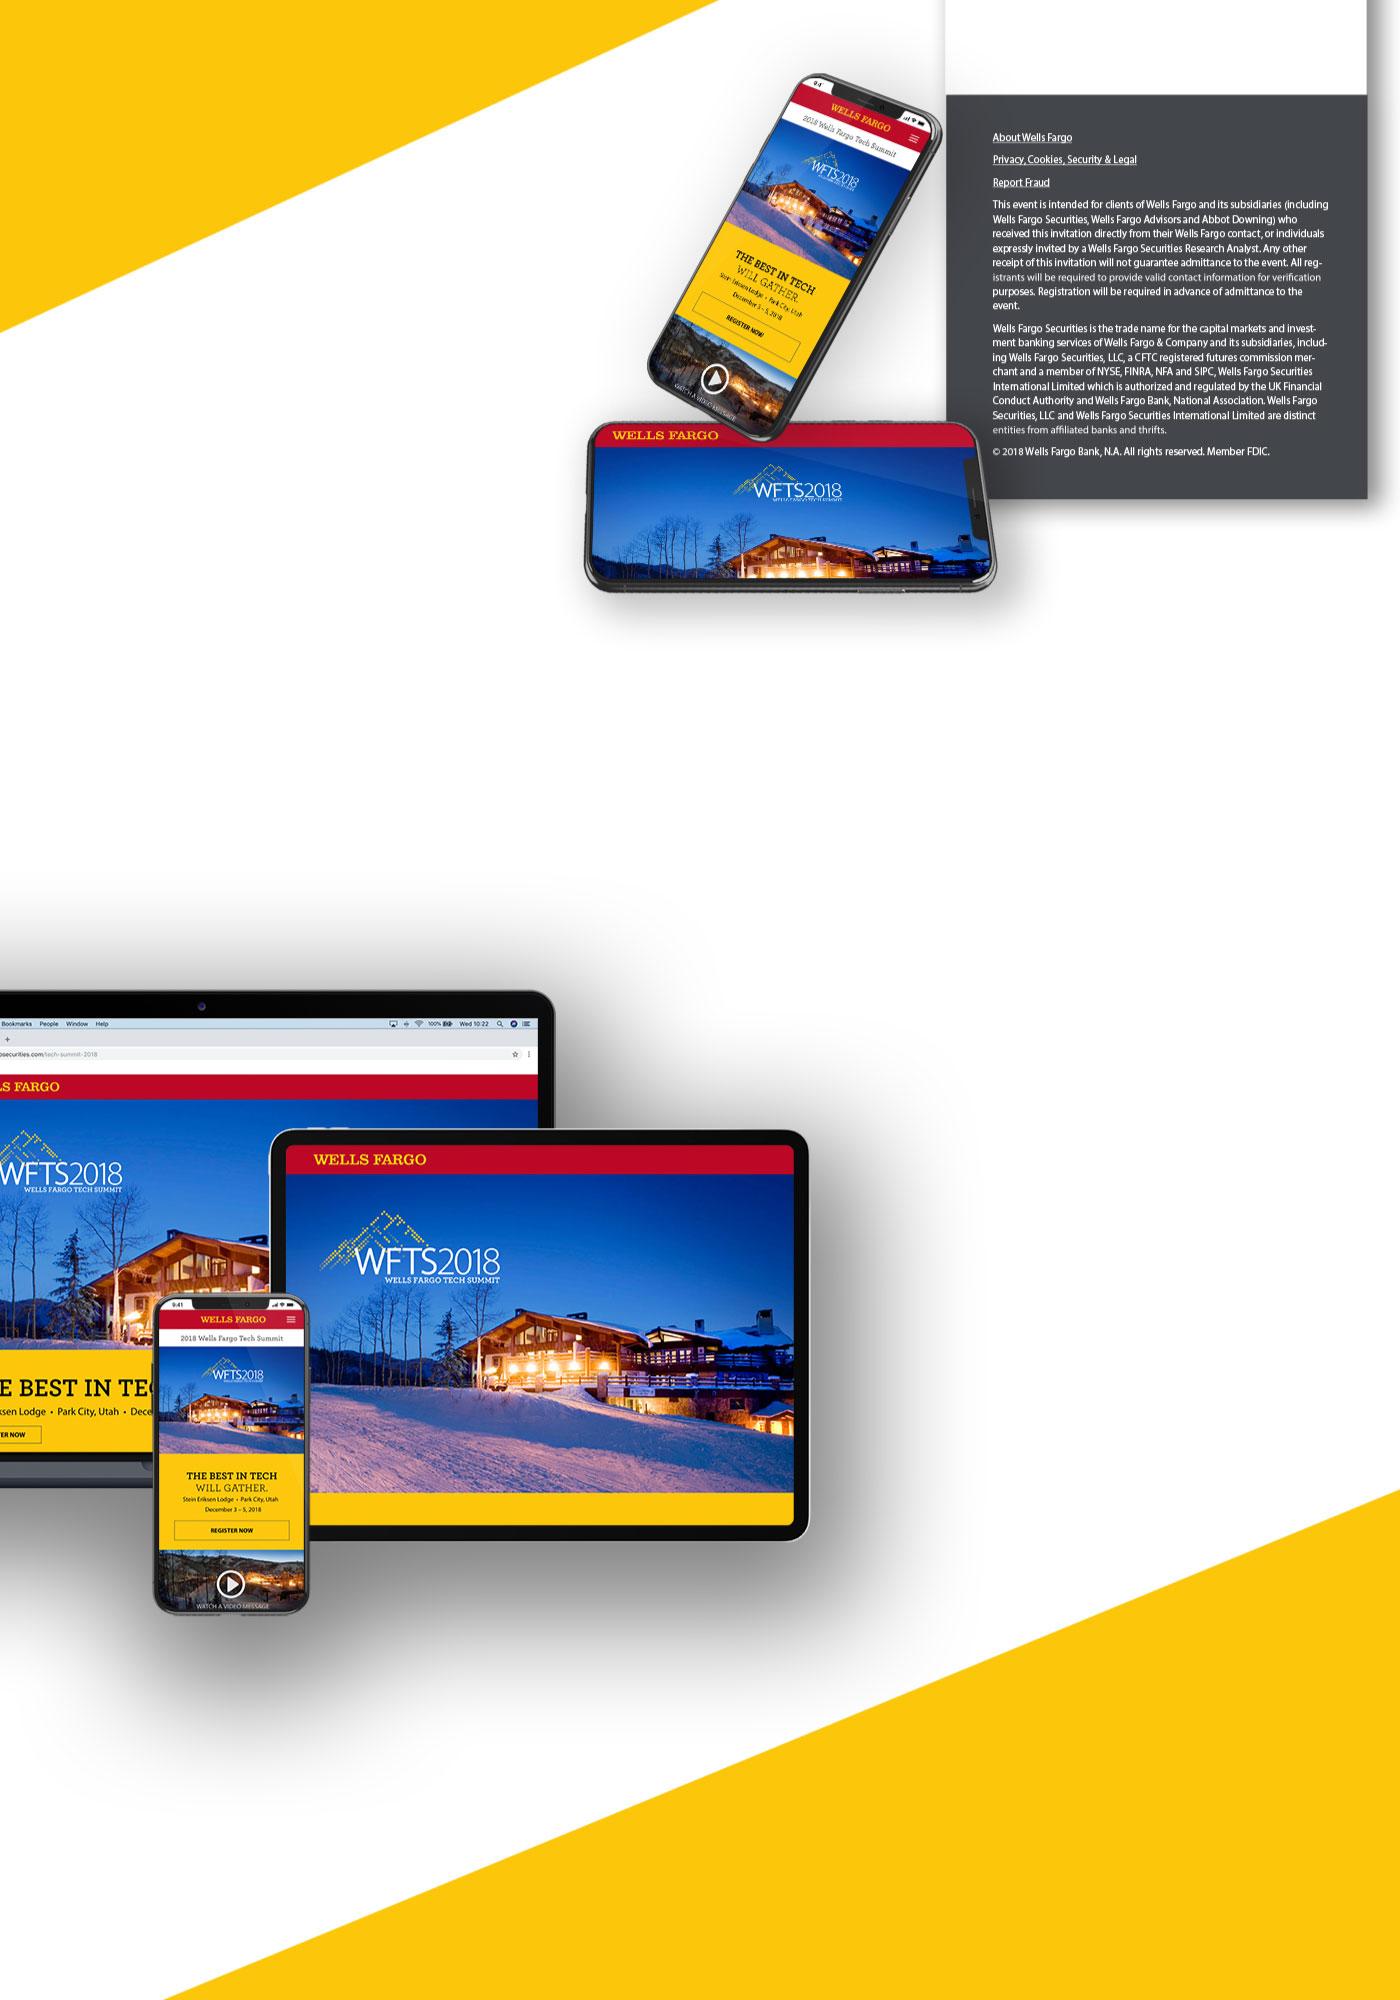 Wells Fargo Tech Summit mockup on MacBook Pro, iPad, and iPhone